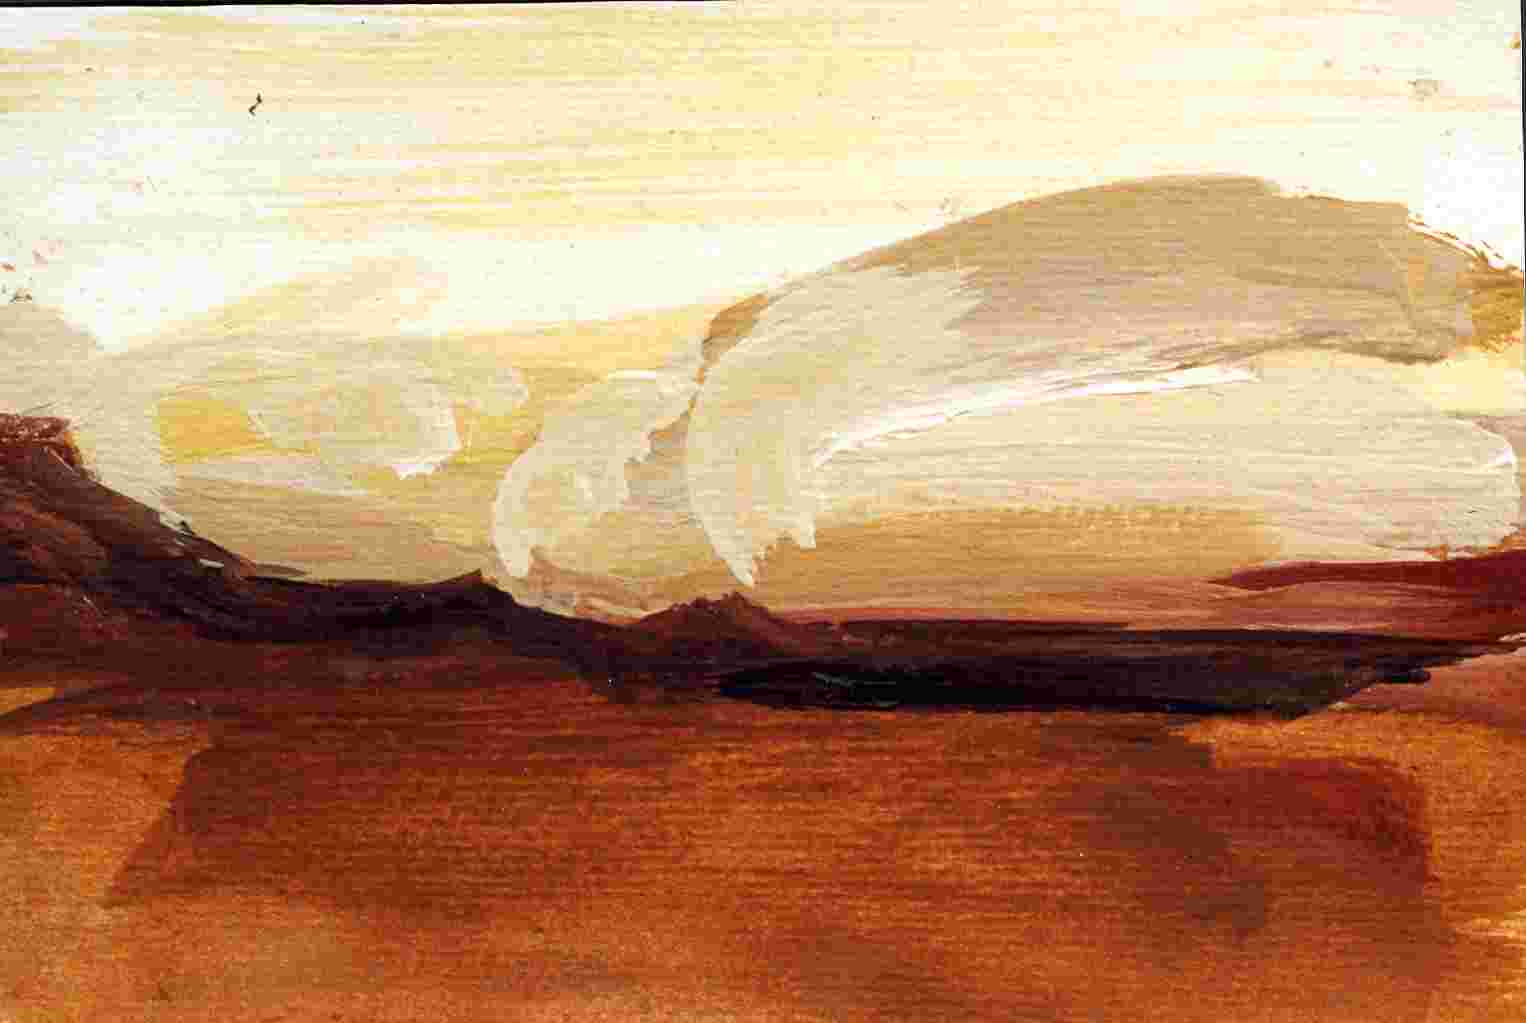 Frauenlandschaft, Öl auf Bütten, 10,5 cm x 14,5 cm , 1997